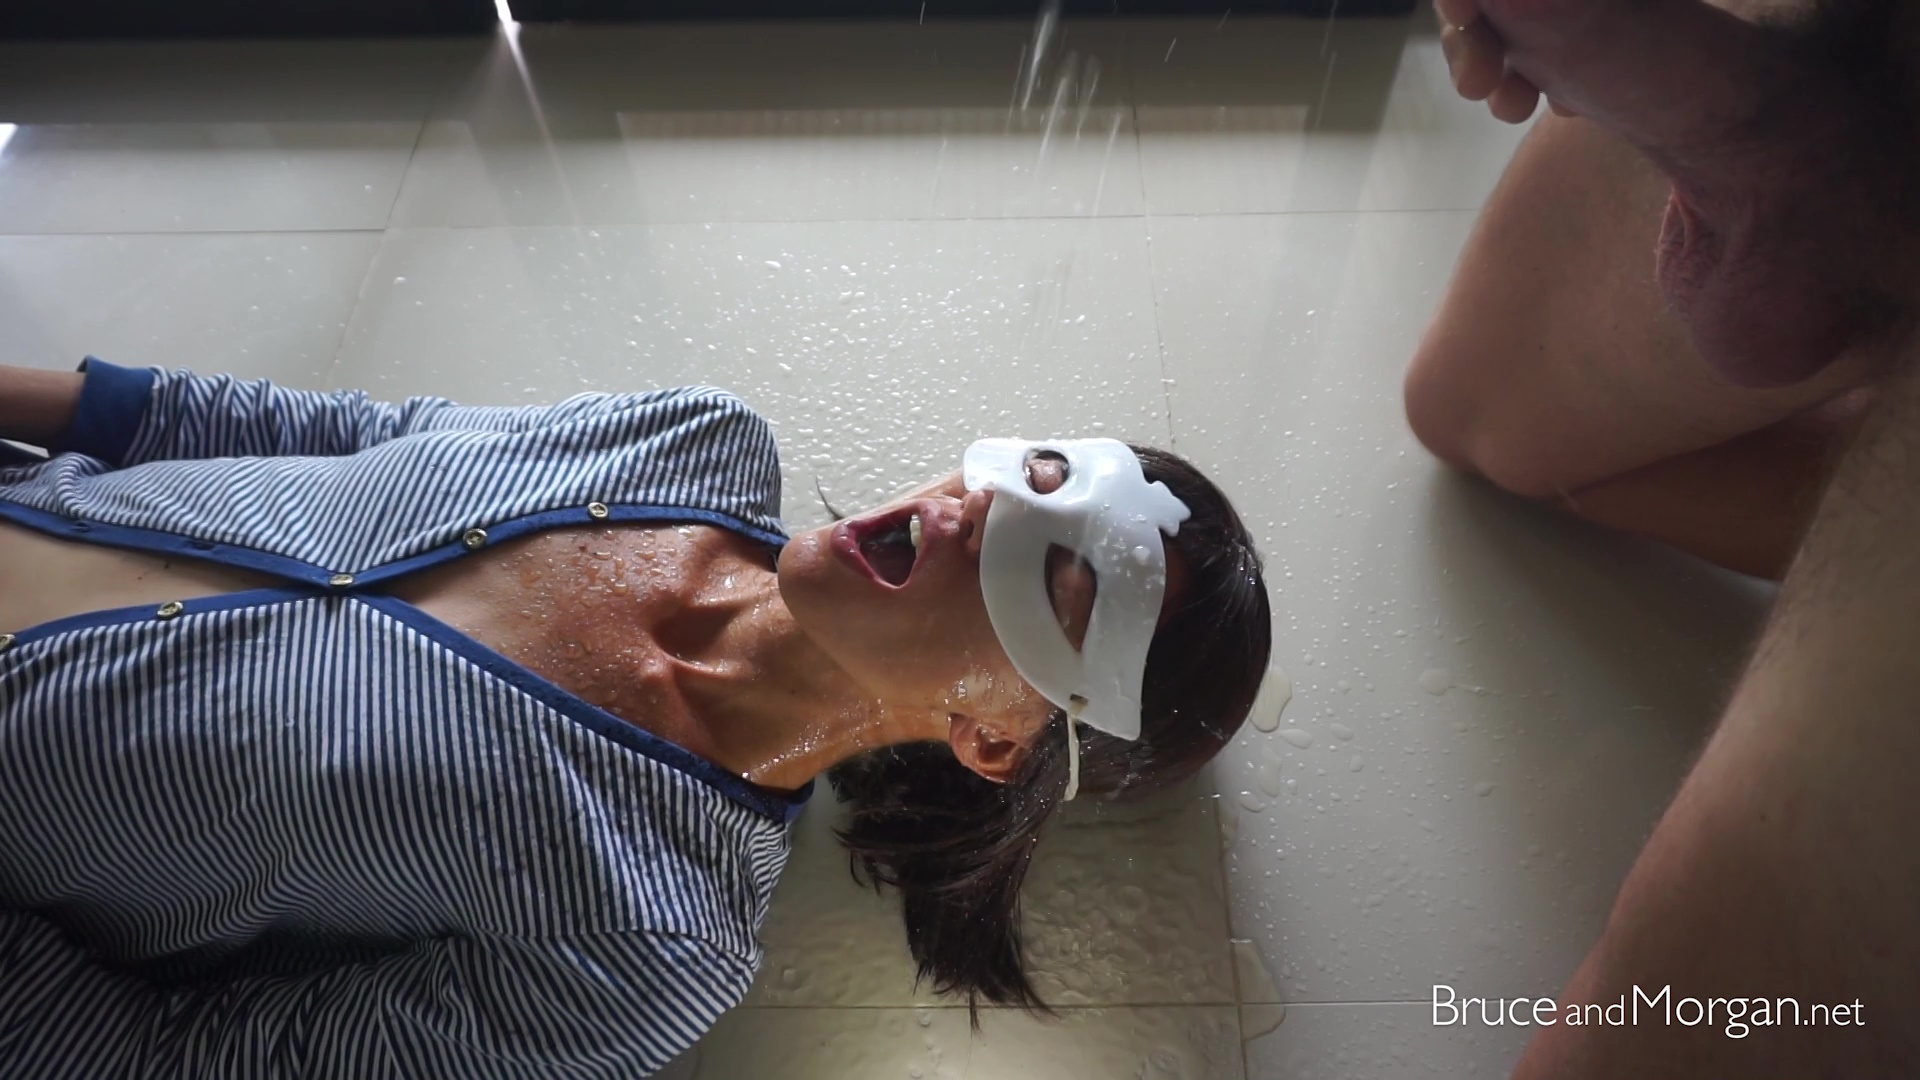 BruceandMorgan - Fluids In Slow-Motion